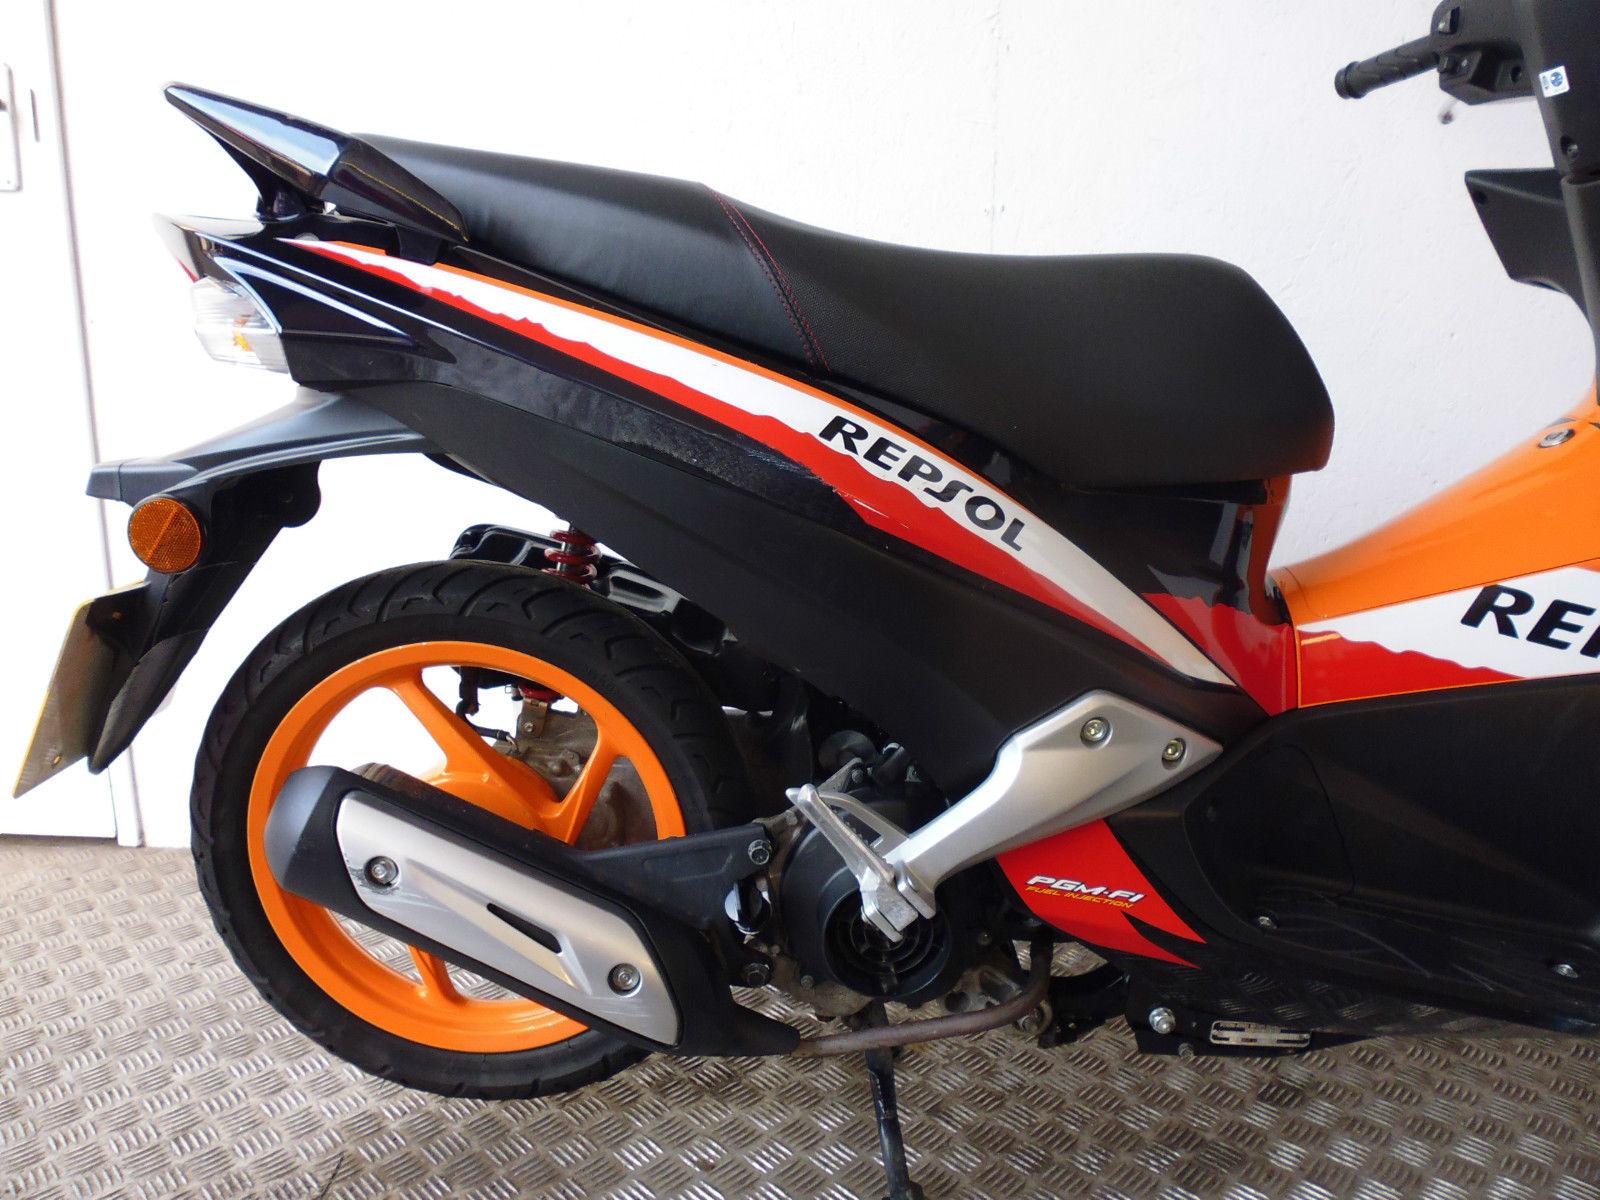 2013 honda nsc 50 repsol race replica learner legal 50cc - Replica mobel legal ...